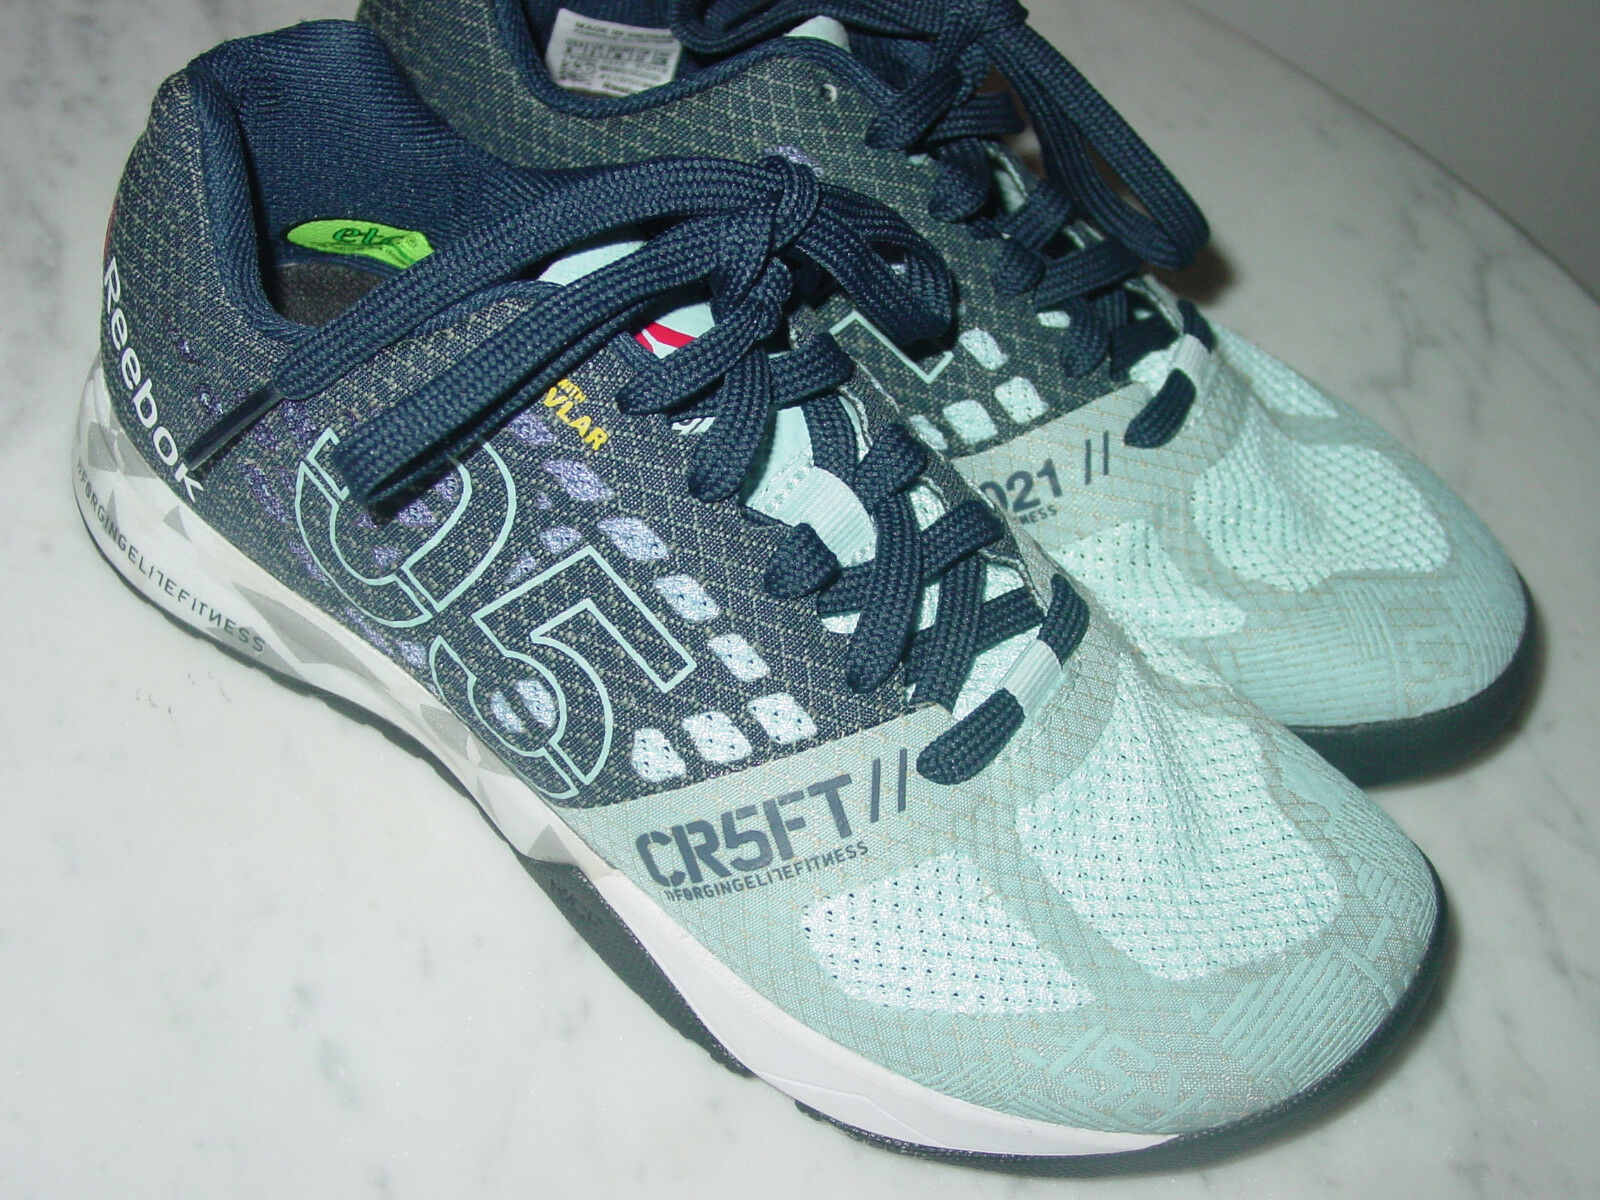 Damenschuhe Reebok Crossfit Nano 5.0 Kevlar Zee Blau V72418 Training Schuhes  Größe 6